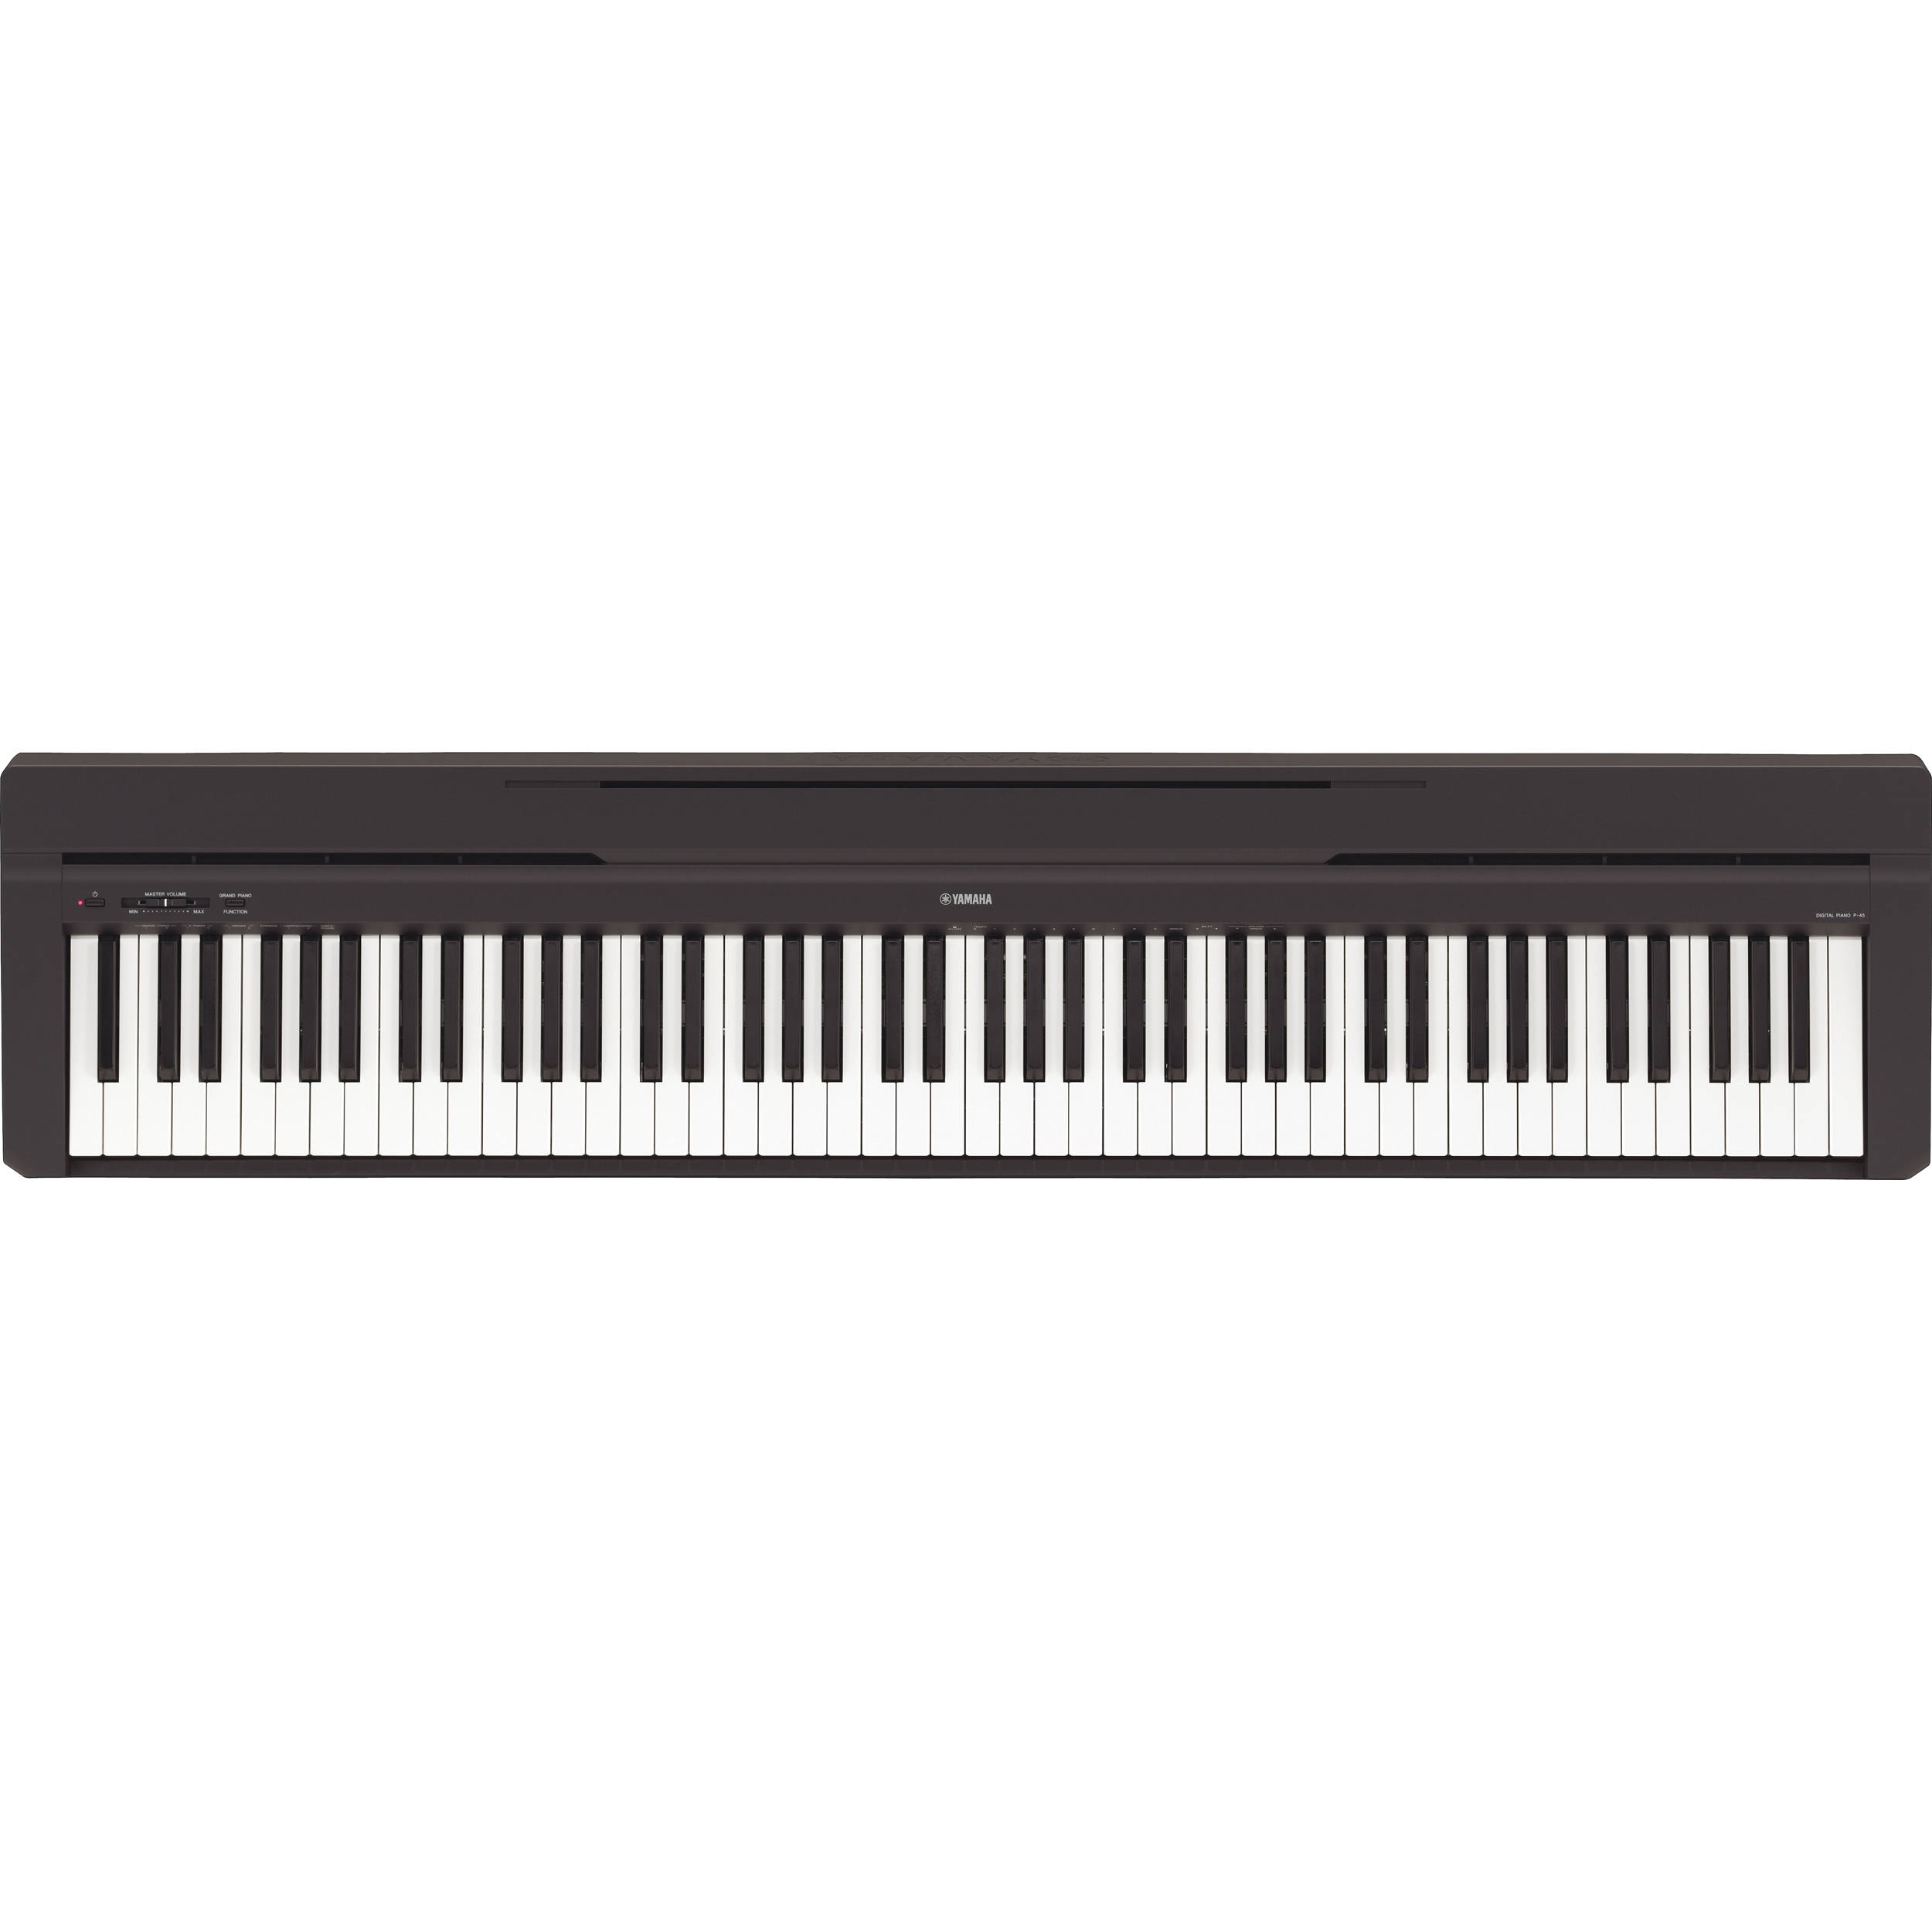 Yamaha p 45 compact 88 key portable digital piano p45b b h for Yamaha p45b keyboard